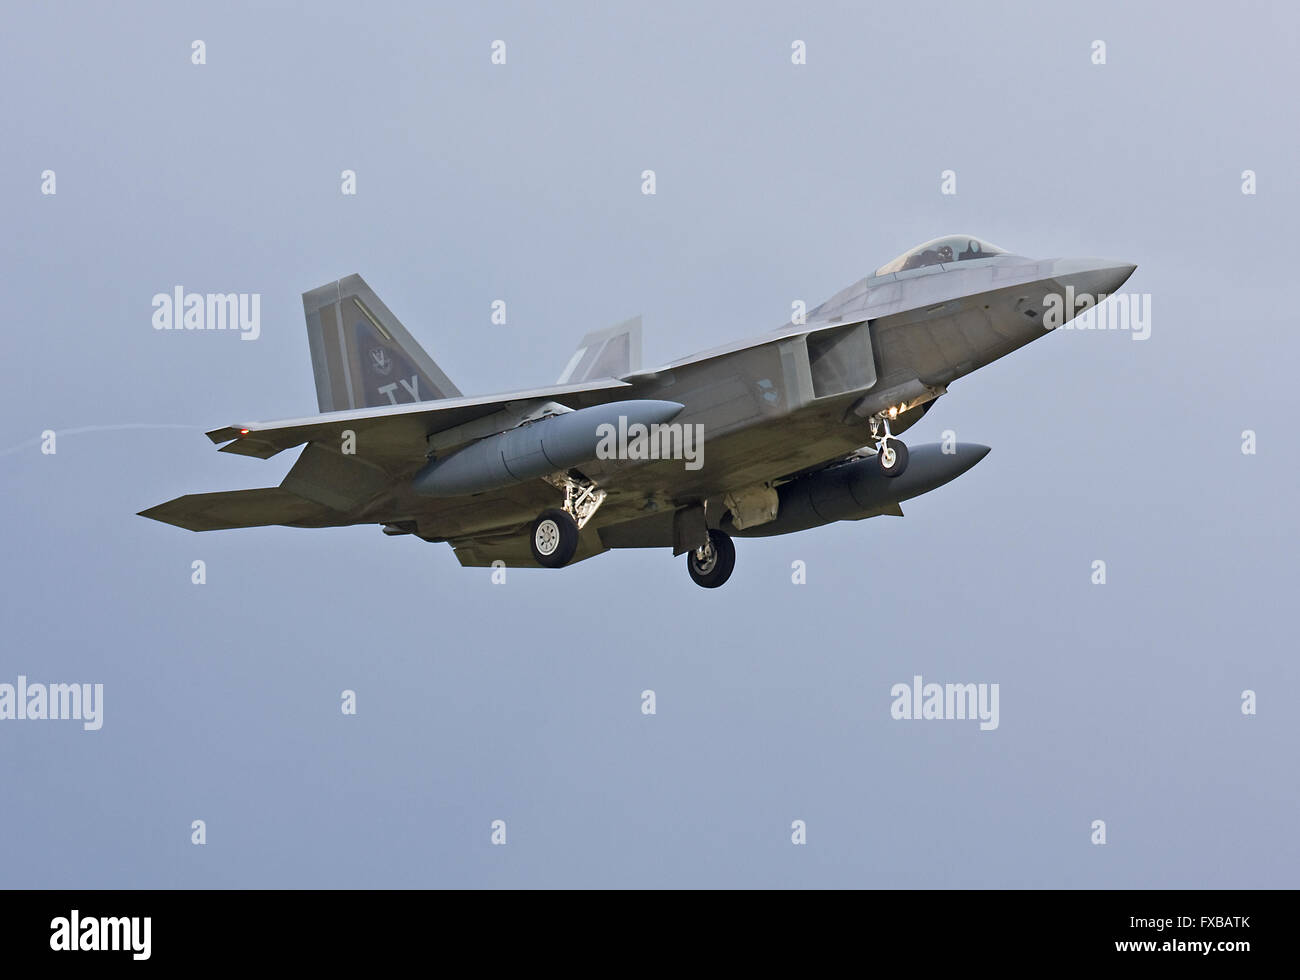 Tyndall AFB based USAF F-22 Raptor landing at RAF Lakenheath, England - Stock Image